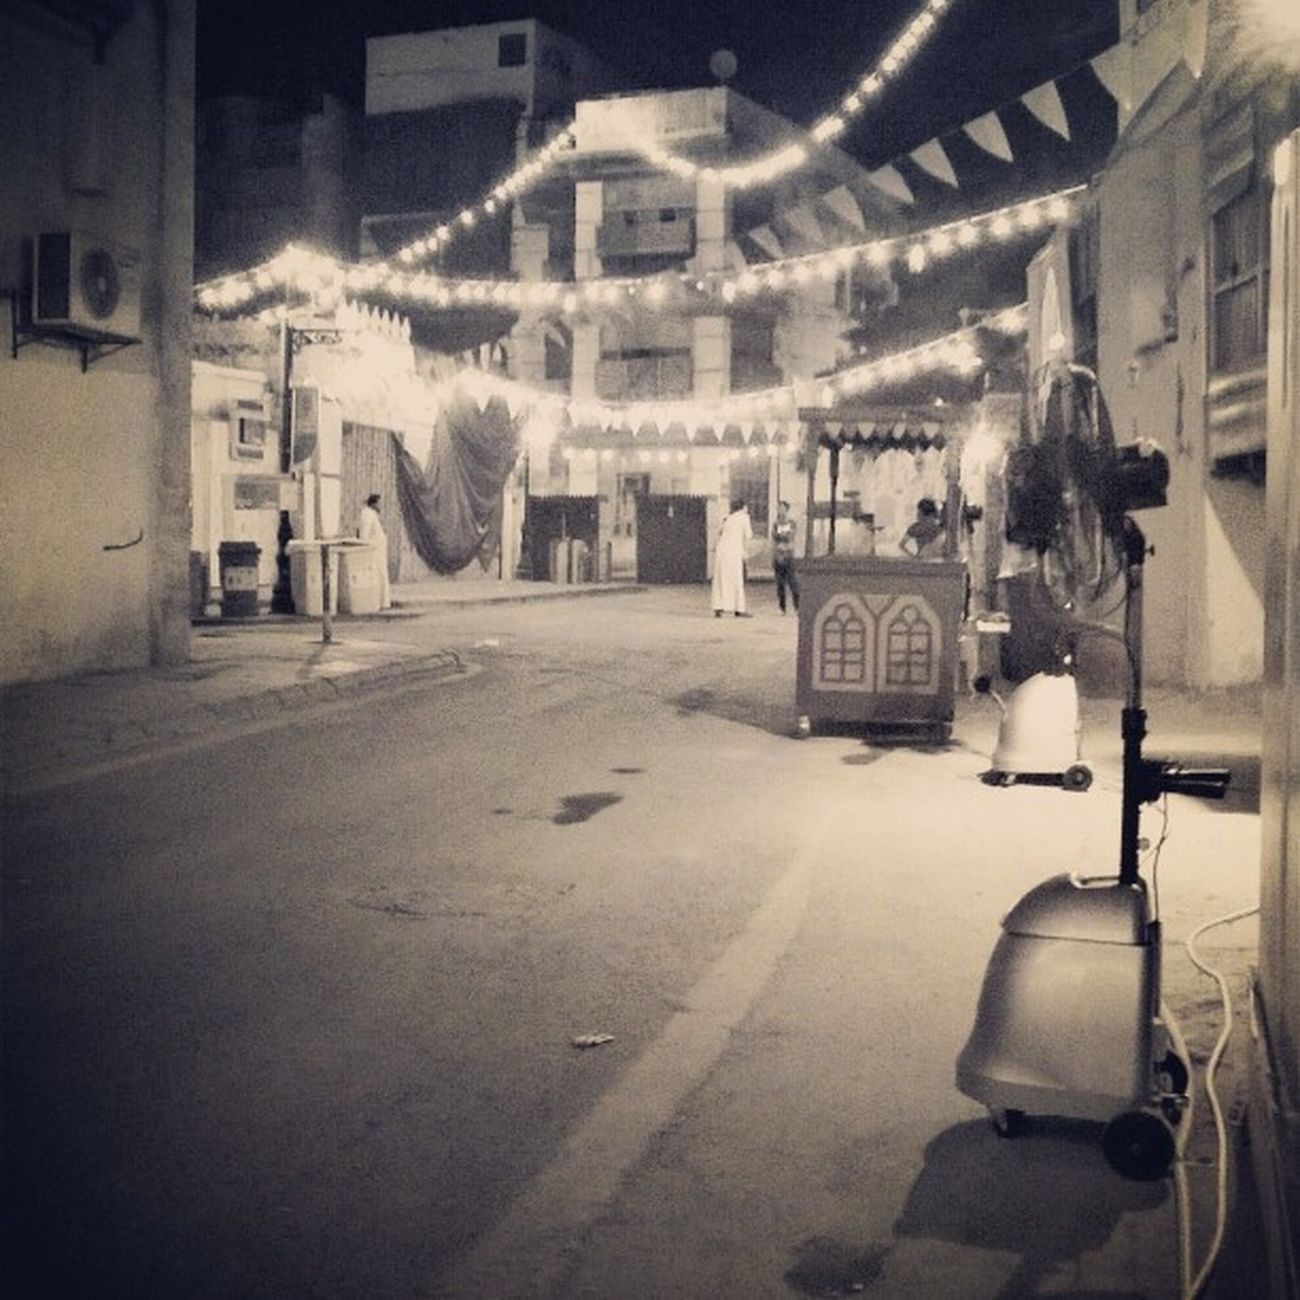 Old Jeddah Baladdistrict Heritage city KSA saudiarabia hotweather ramadans